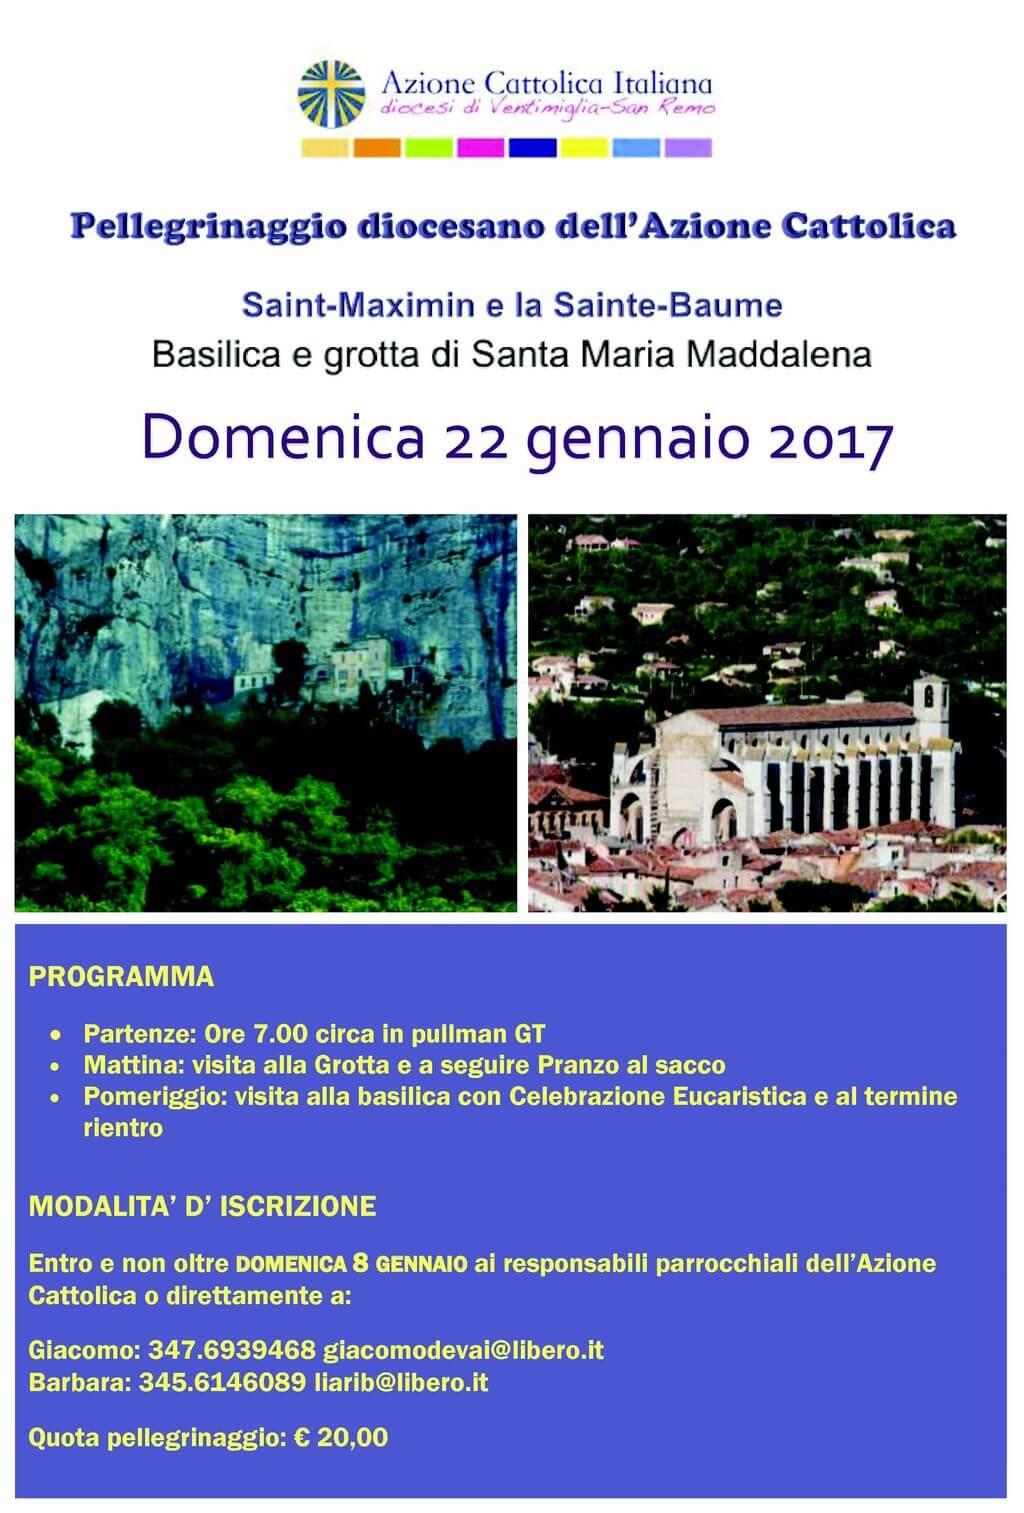 Pellegrinaggio unitario 22 gennaio 2017 azione for Garage santamaria saint maximin